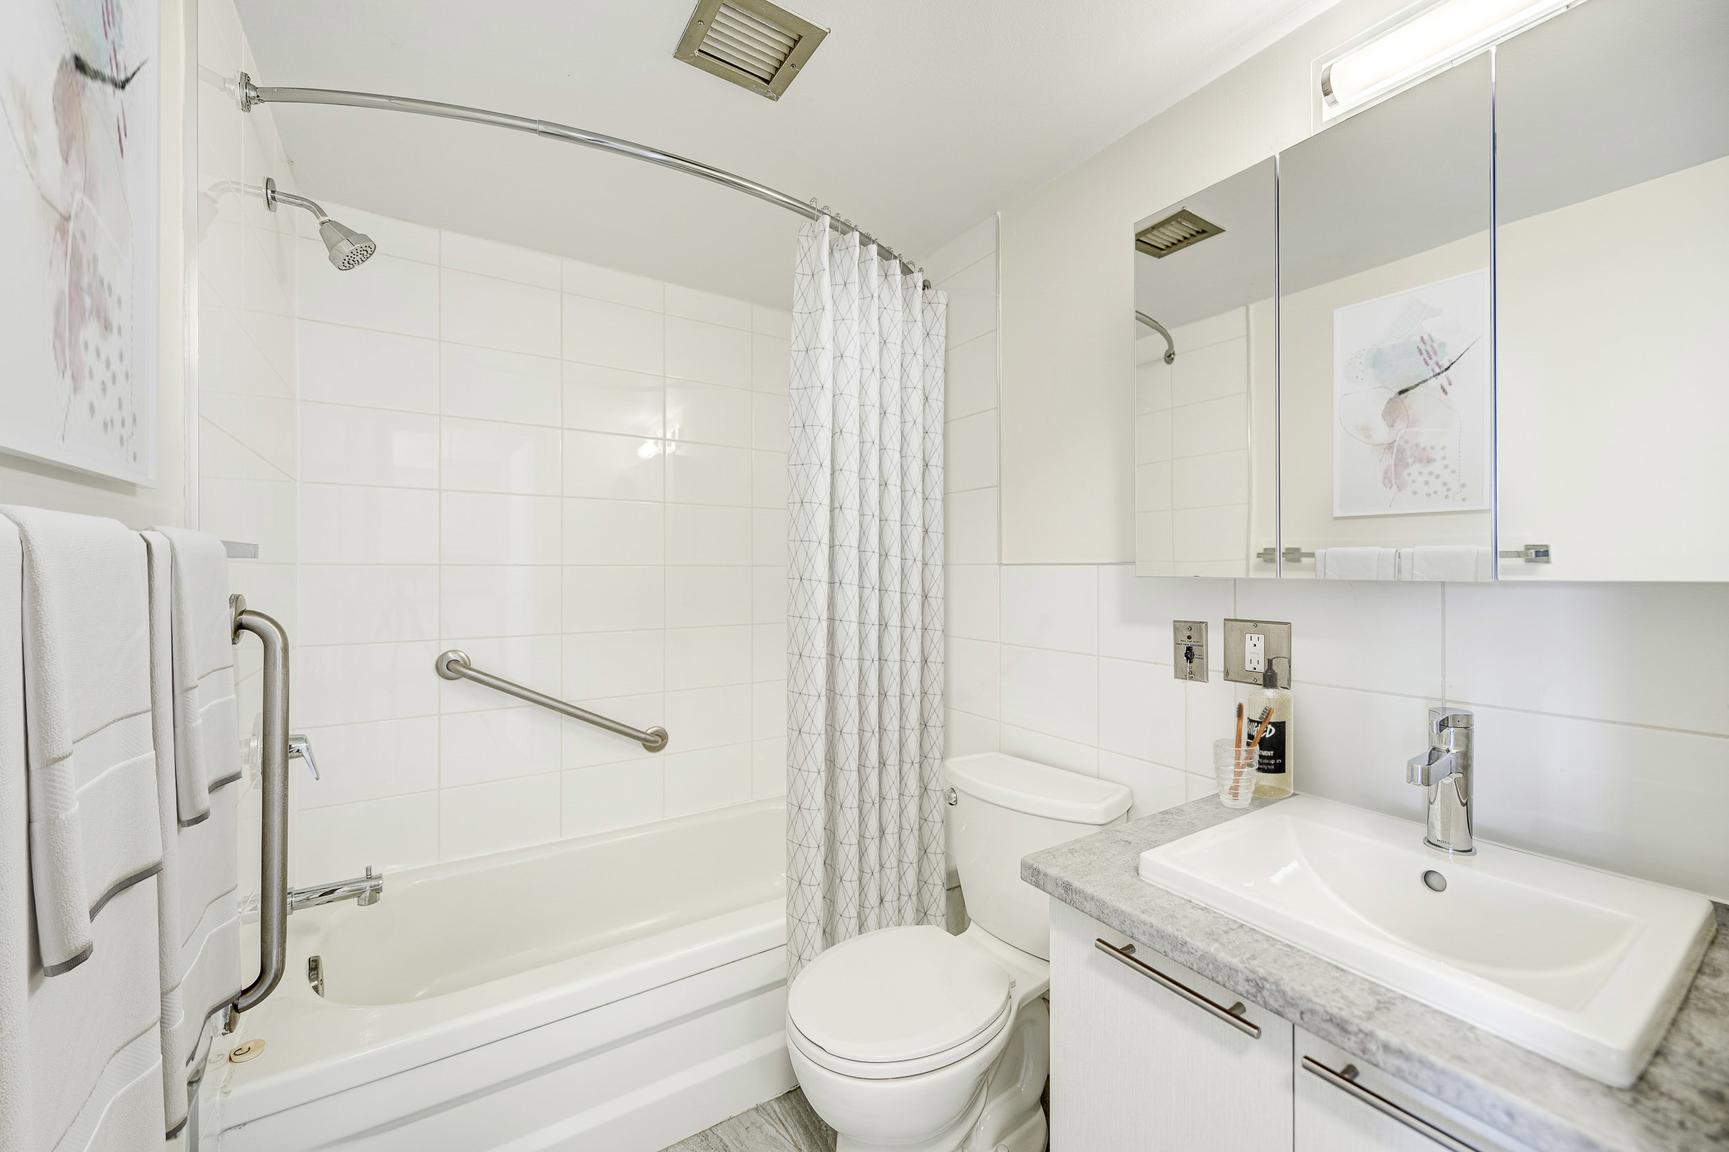 1 bedroom Apartments for rent in Laval at Le Quatre Cent - Photo 05 - RentersPages – L407183